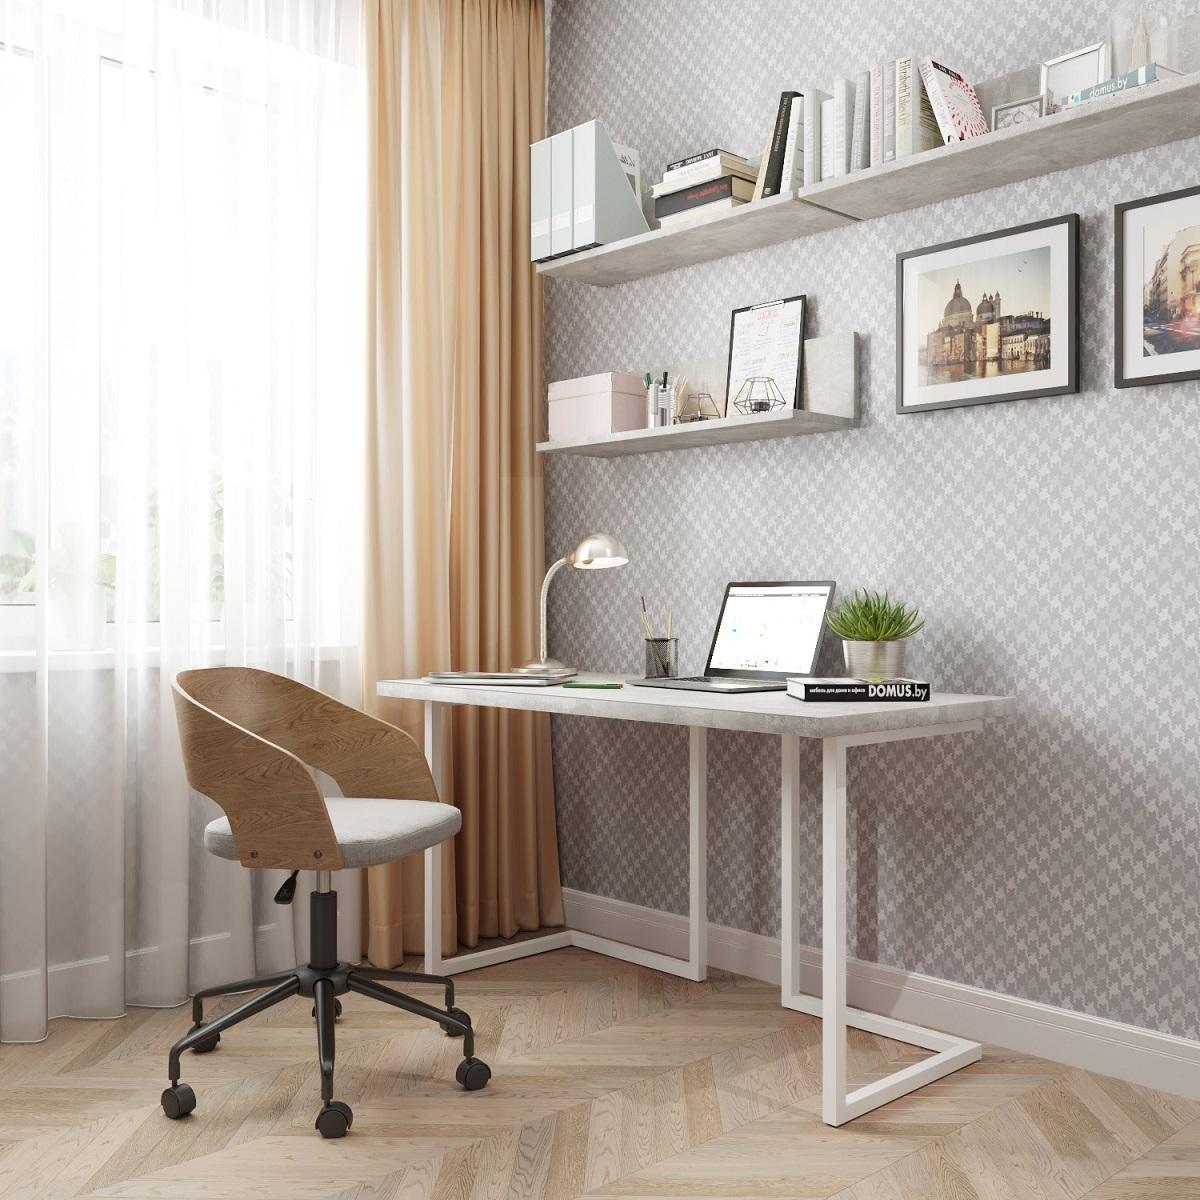 Письменный стол ДОМУС Урбан-1 бетон серый/металл белый